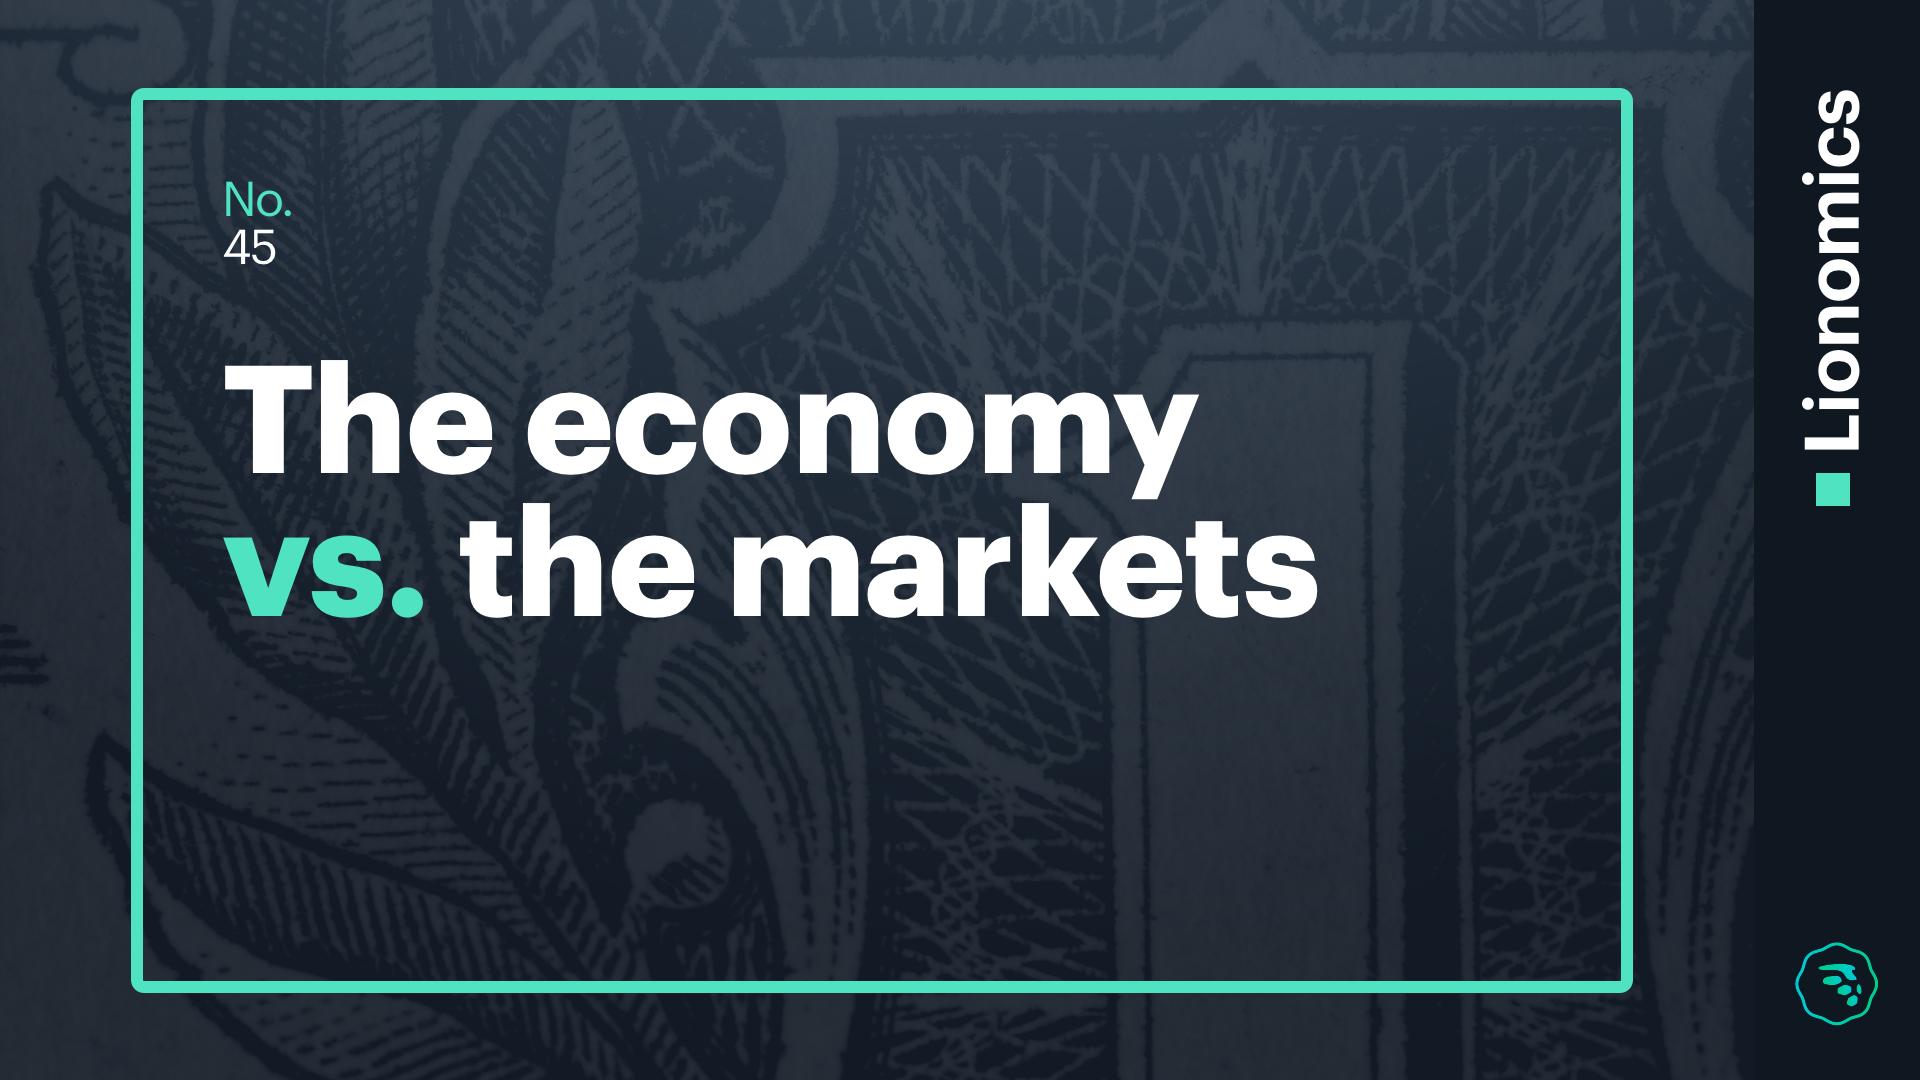 Lionomics 45 BLOG The economy vs the markets 12032018